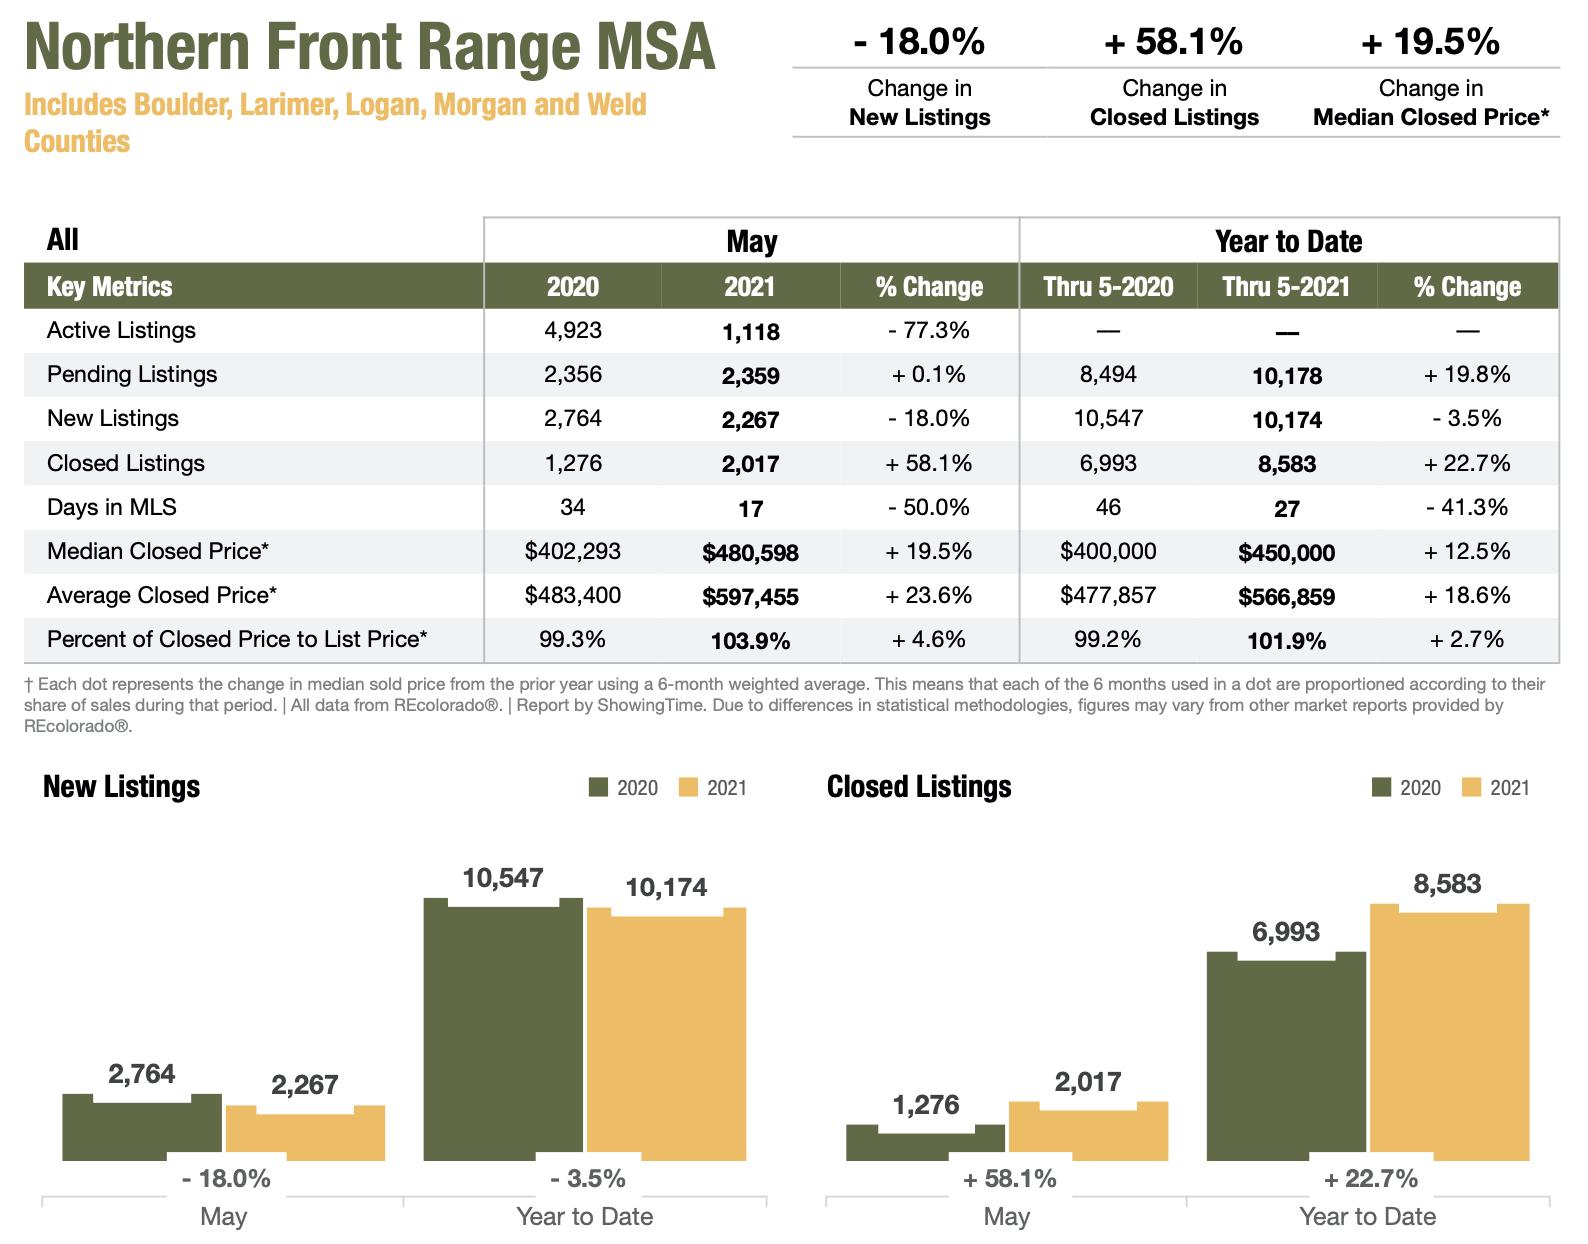 Colorado Real Estate Market Report Northern Front Range MSA May 2021